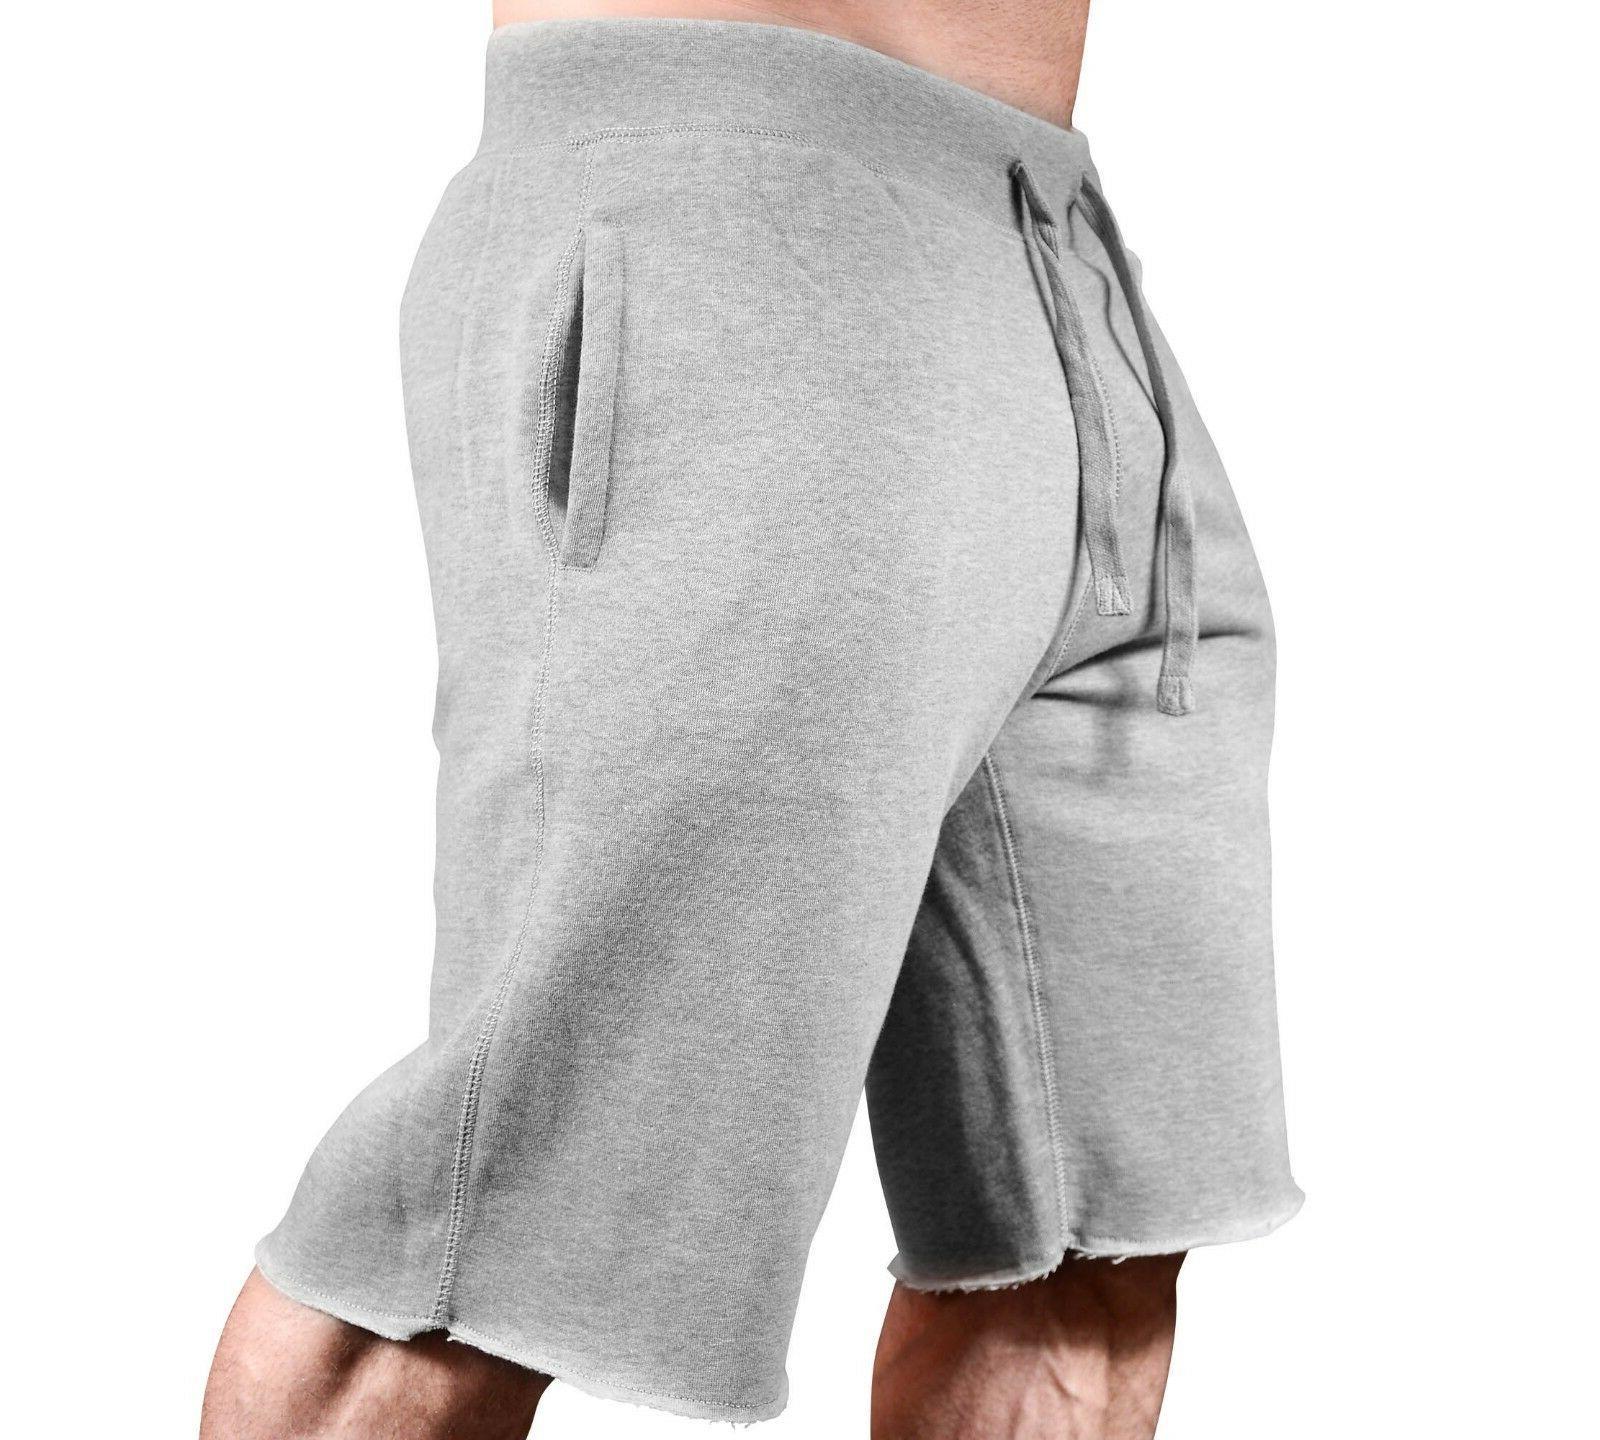 New Fitness Sweatshorts - Classic